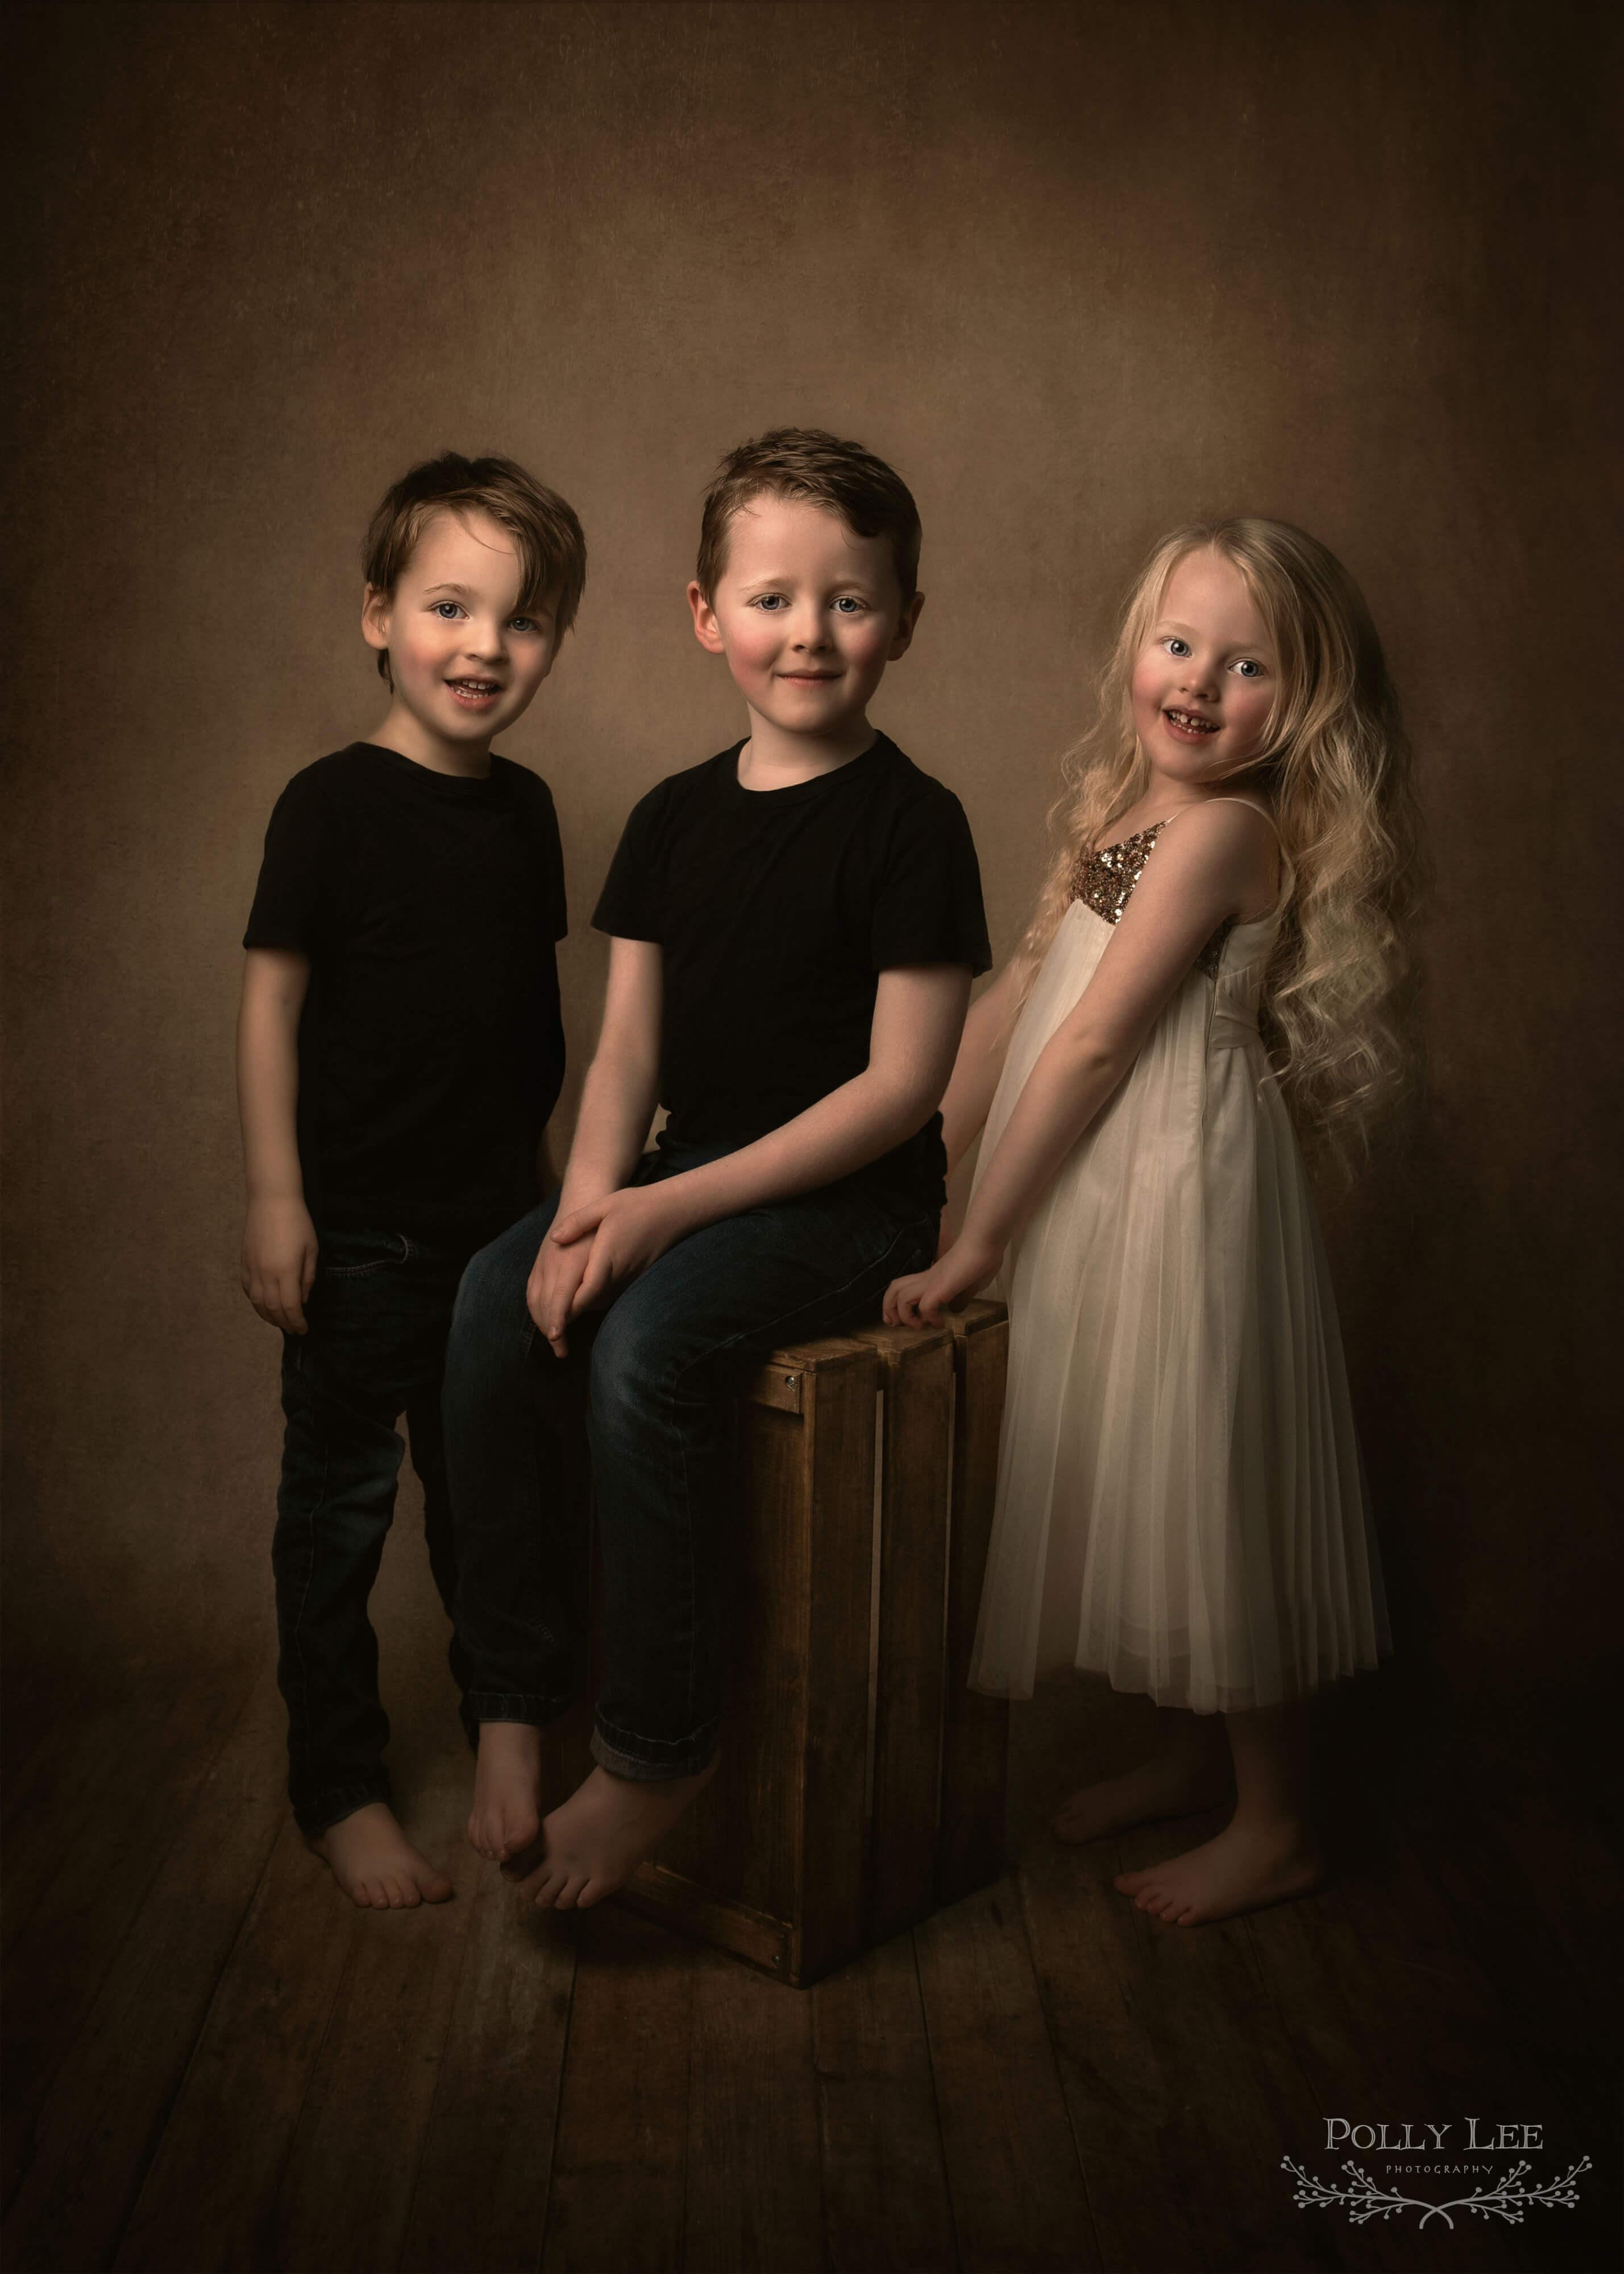 Family children's portrait